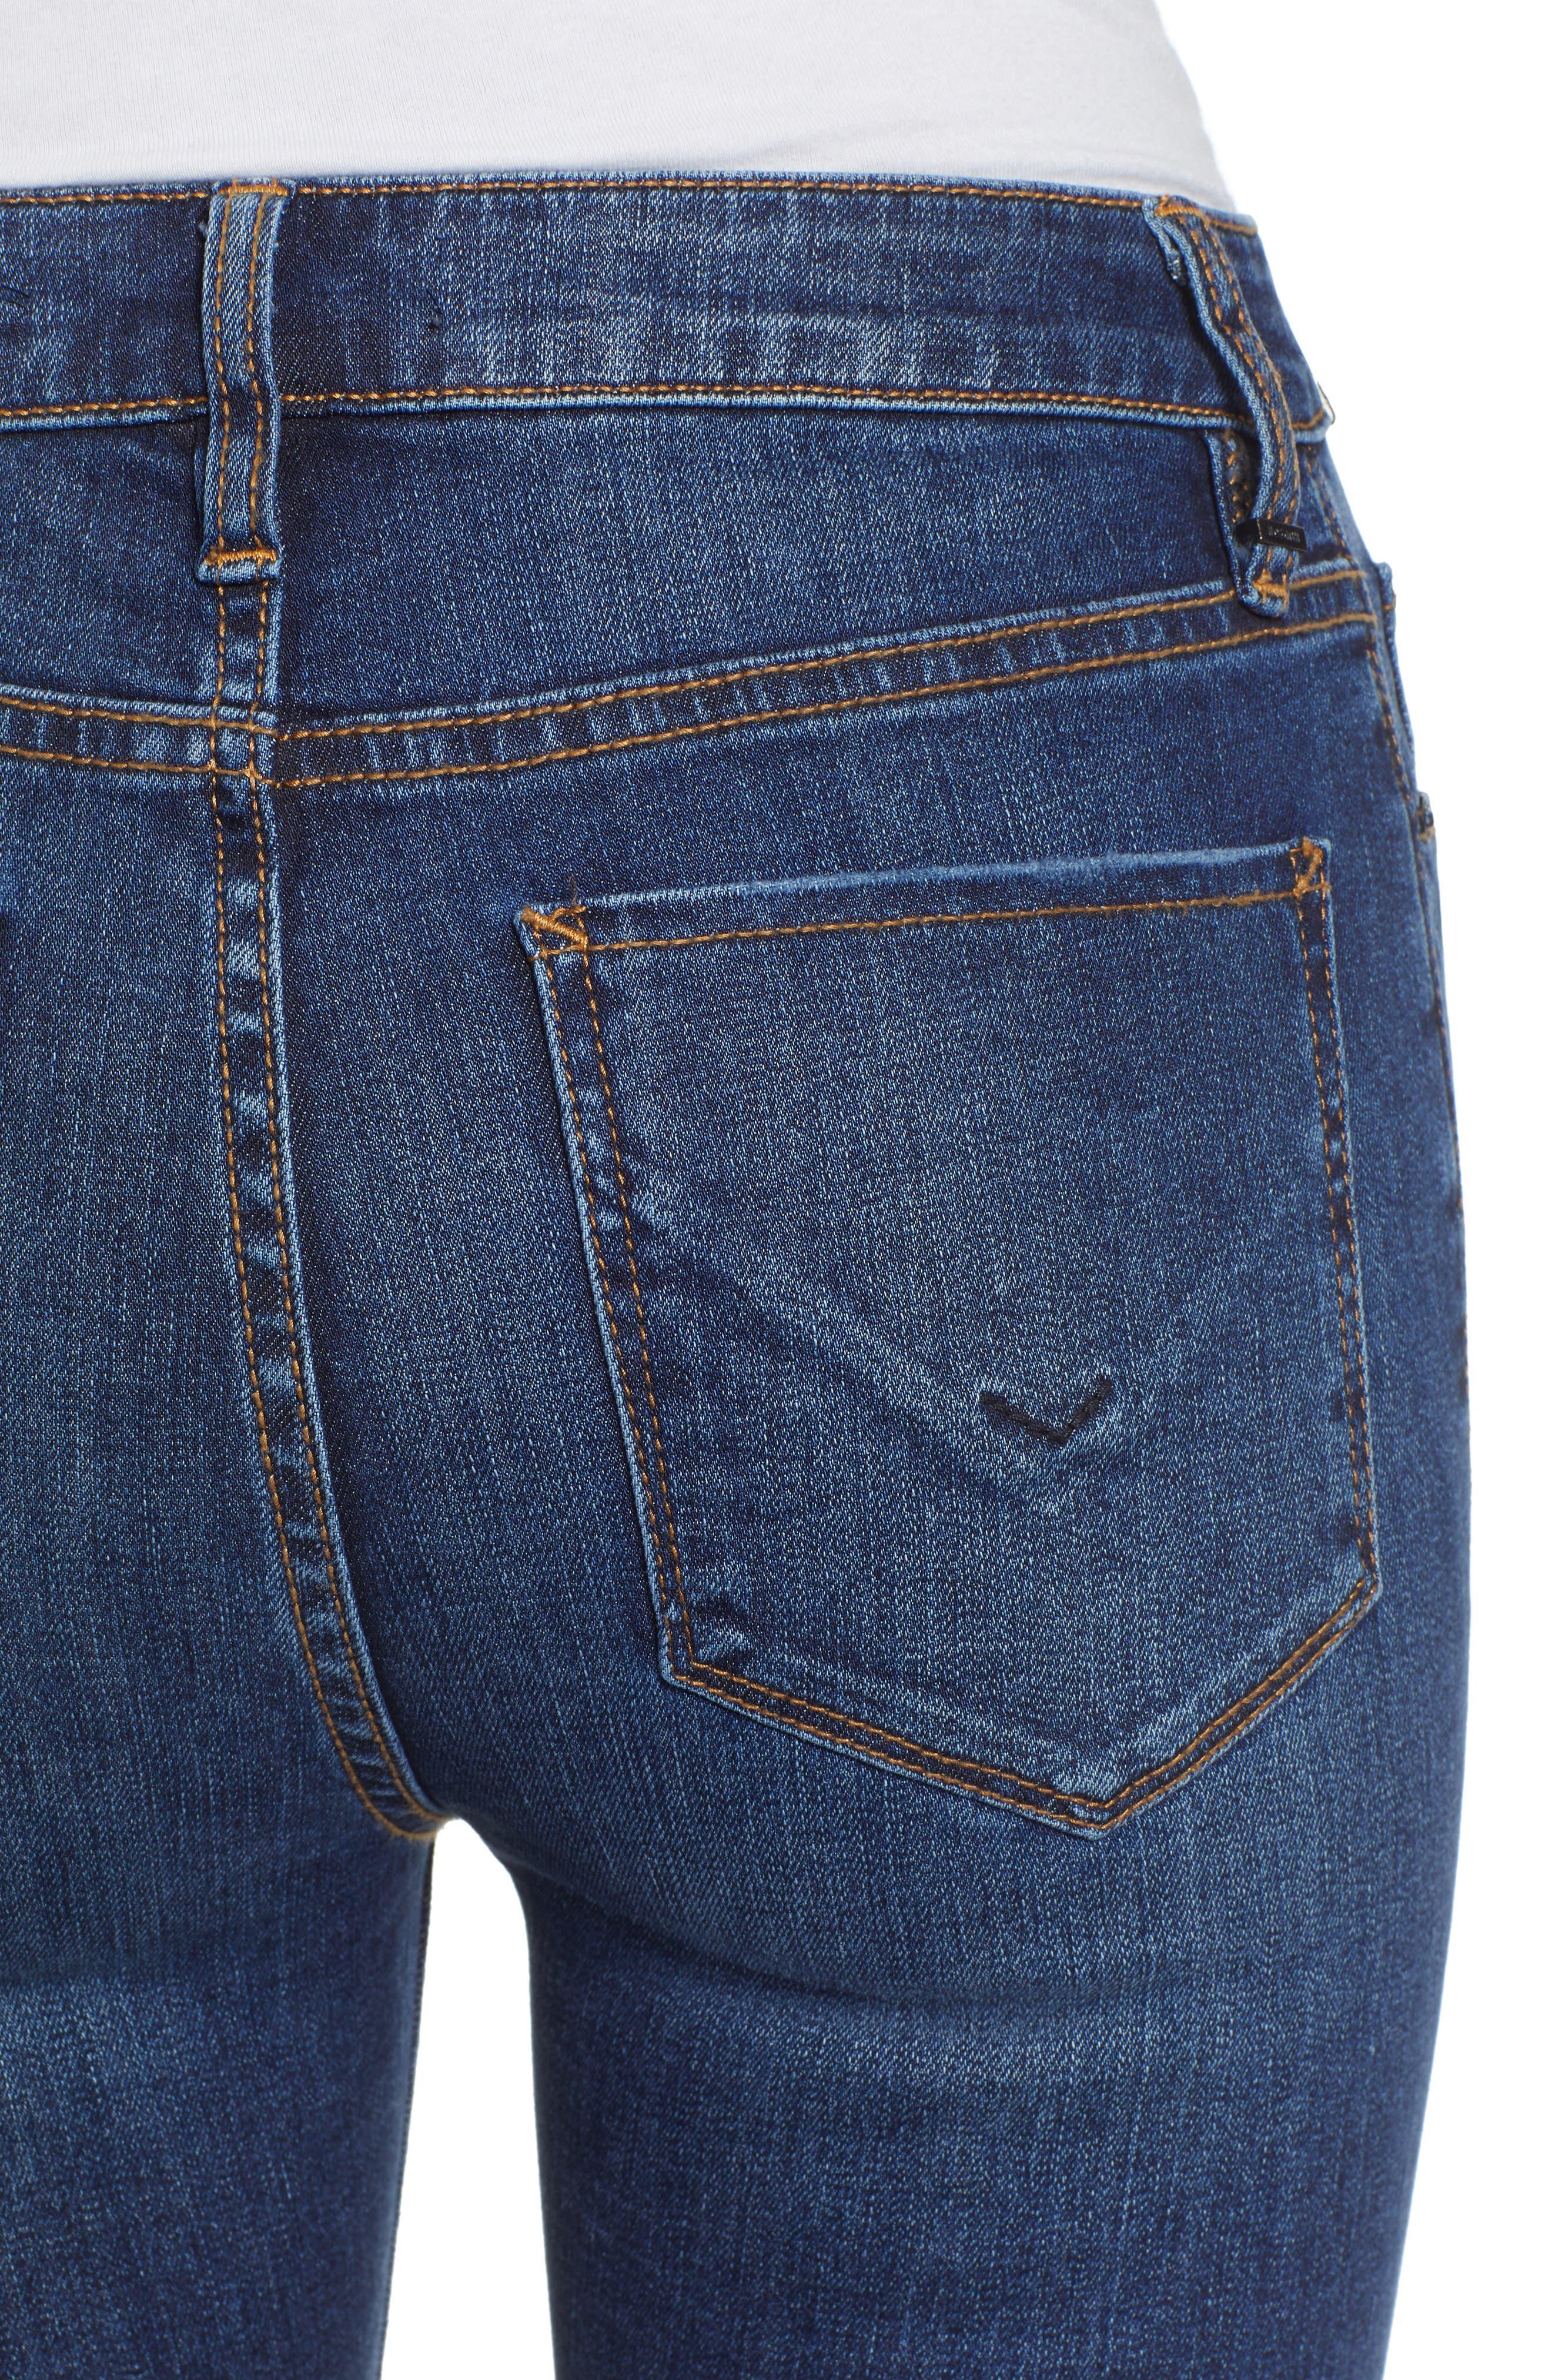 HUDSON JEANS, Holly High Waist Flare Jeans, Alternate thumbnail 5, color, VAGABOND